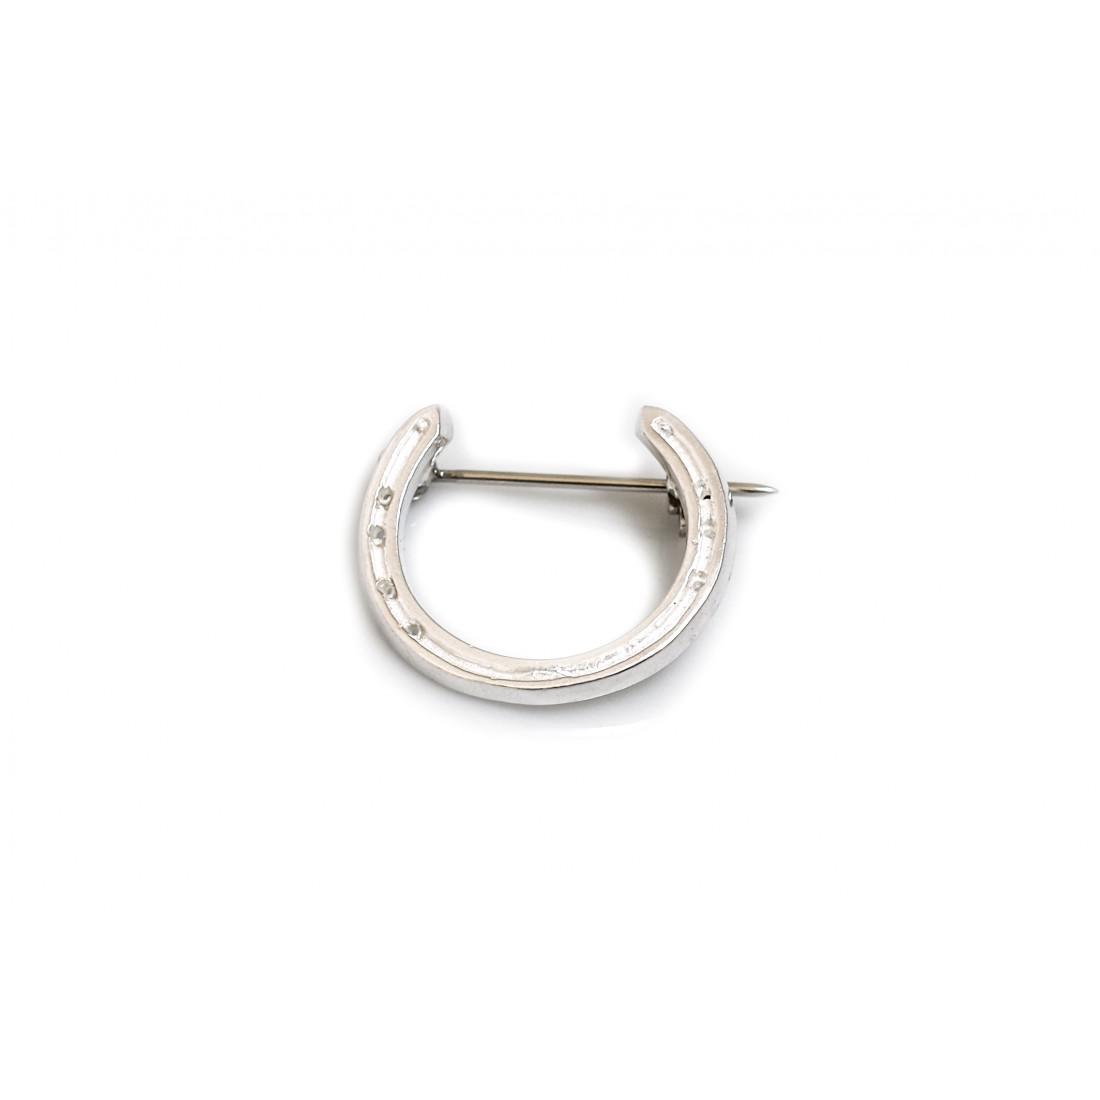 Sterling Silver Horseshoe Brooch